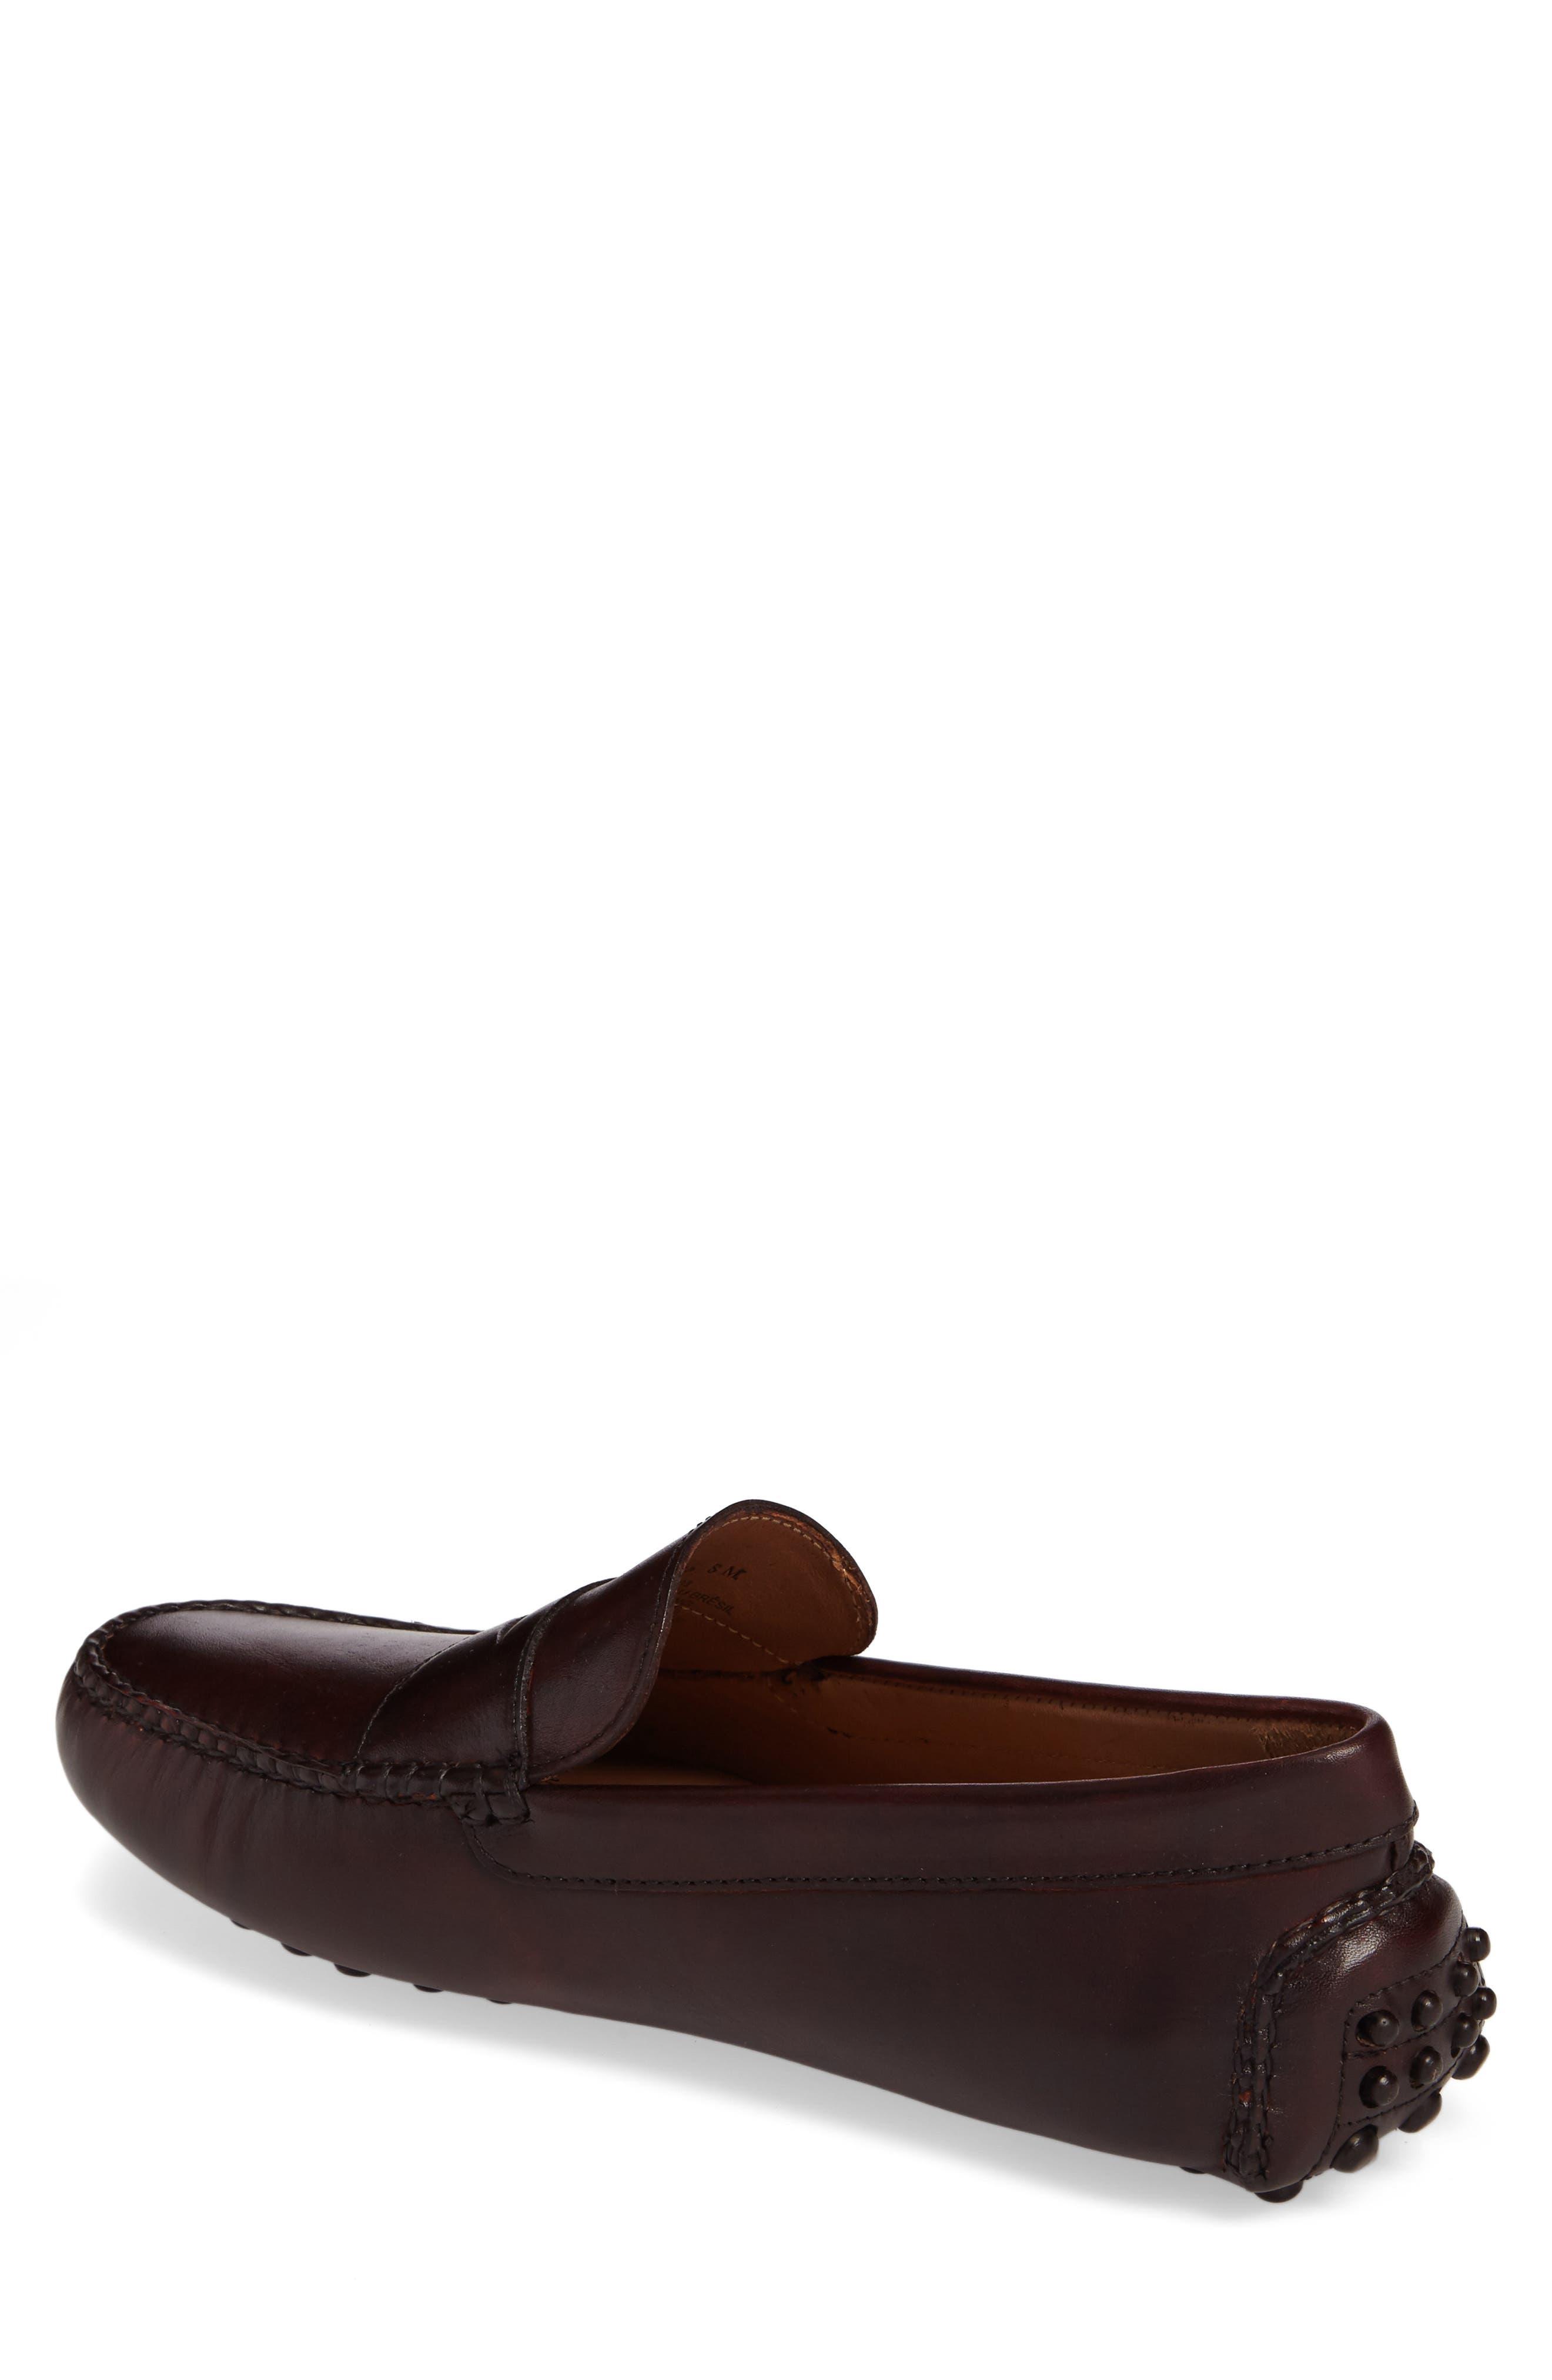 Alternate Image 2  - John W. Nordstrom® Eaton Driving Shoe (Men)